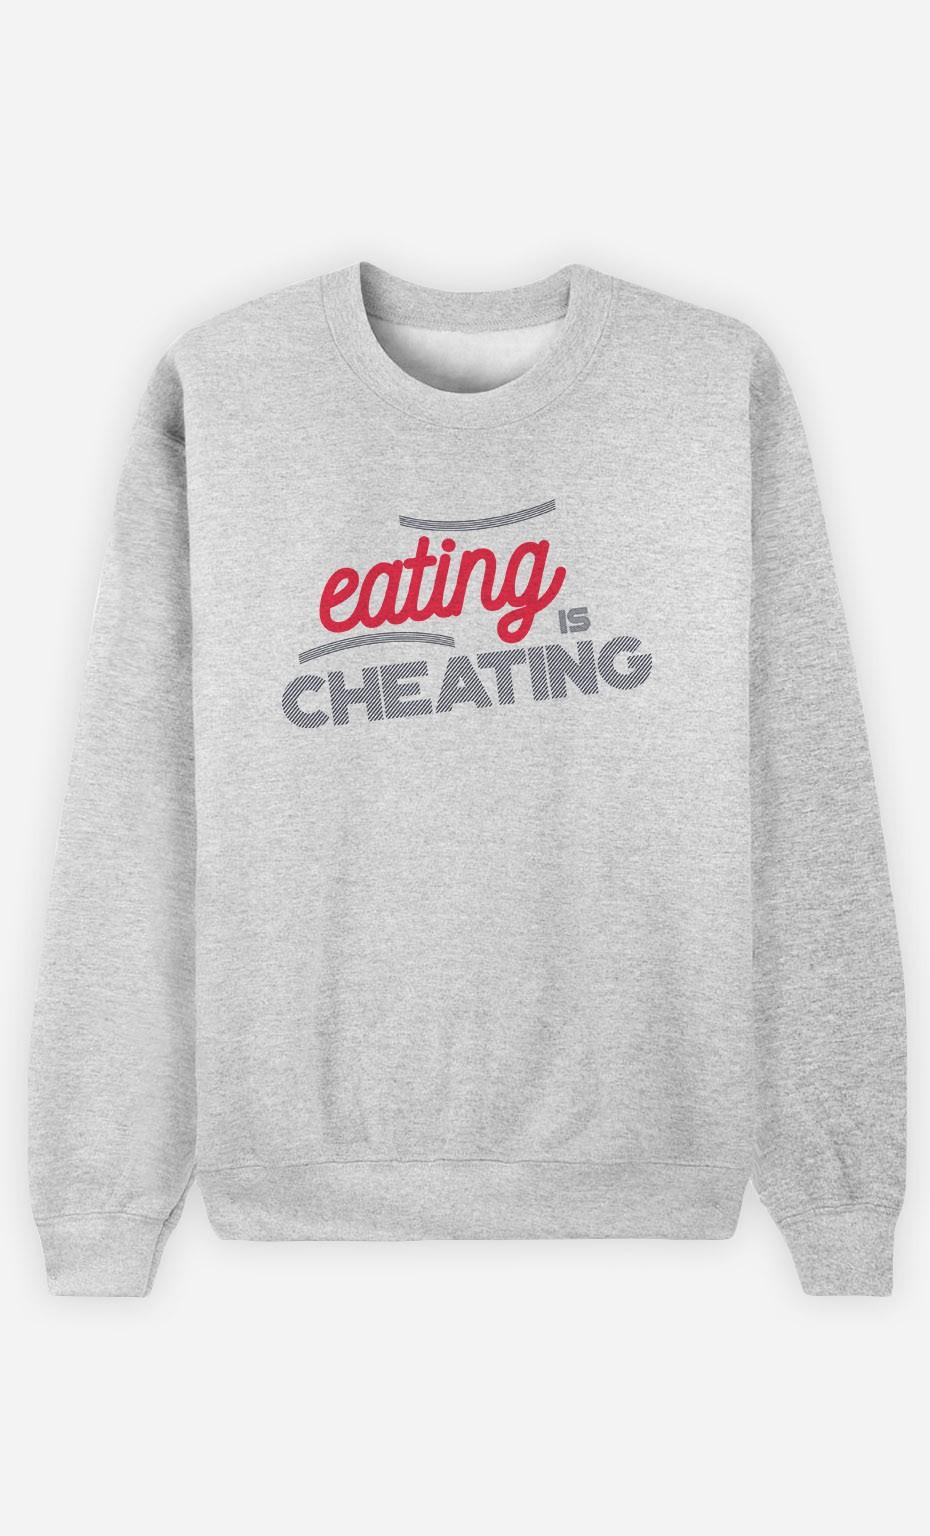 Sweatshirt Eating Is Cheating